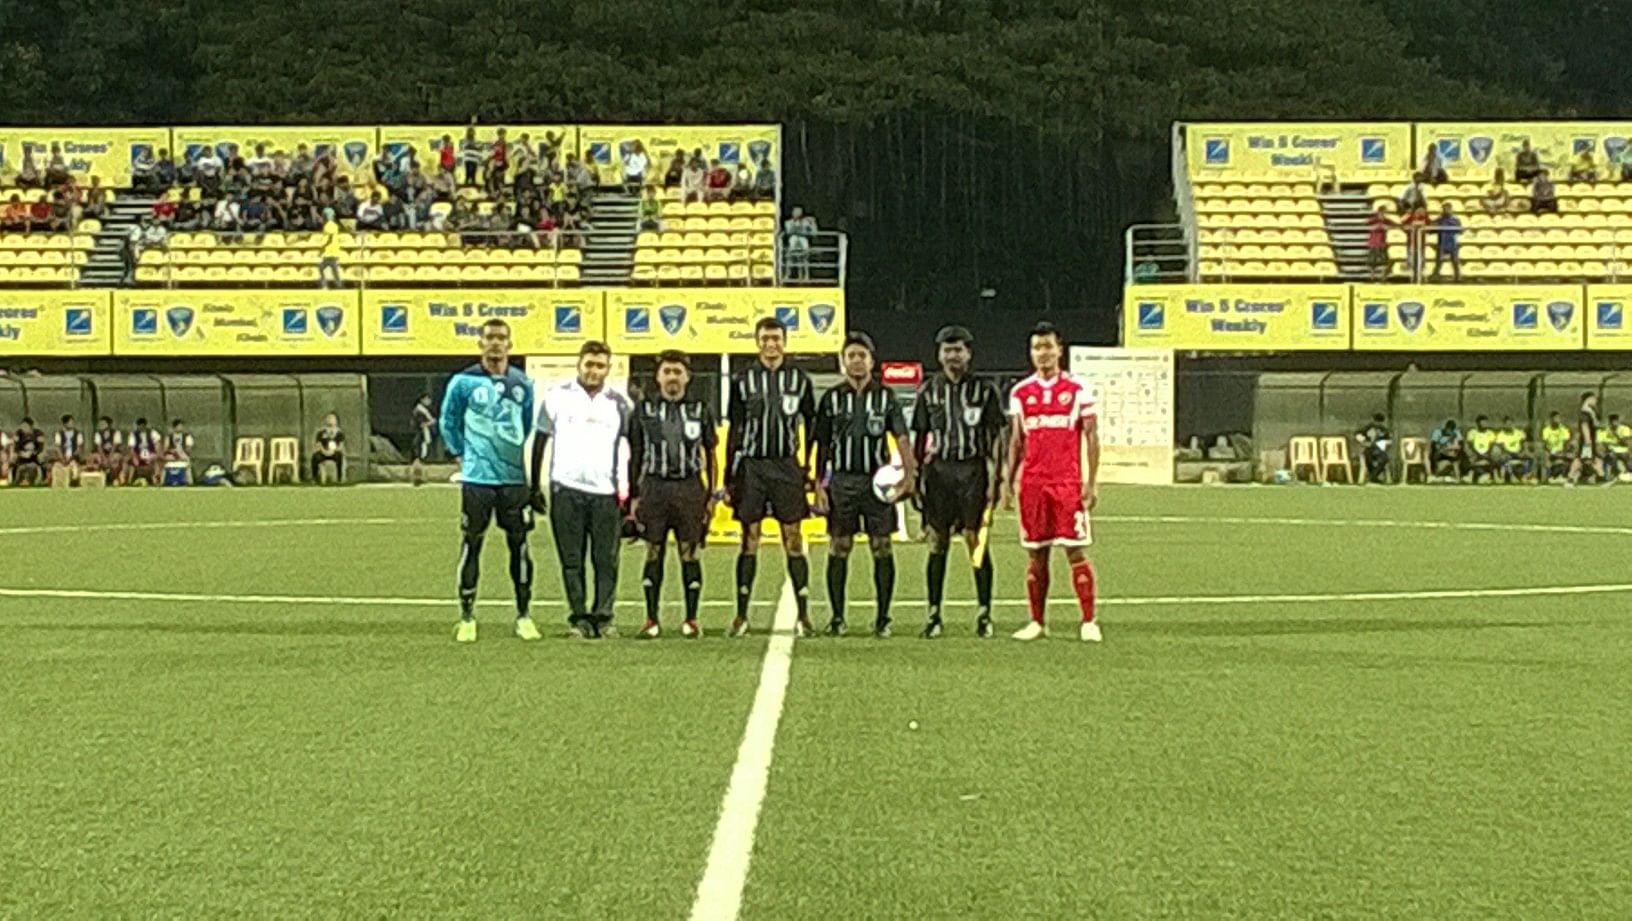 Mumbai FC 0-6 Shillong Lajong; The Reds hit a six away from home